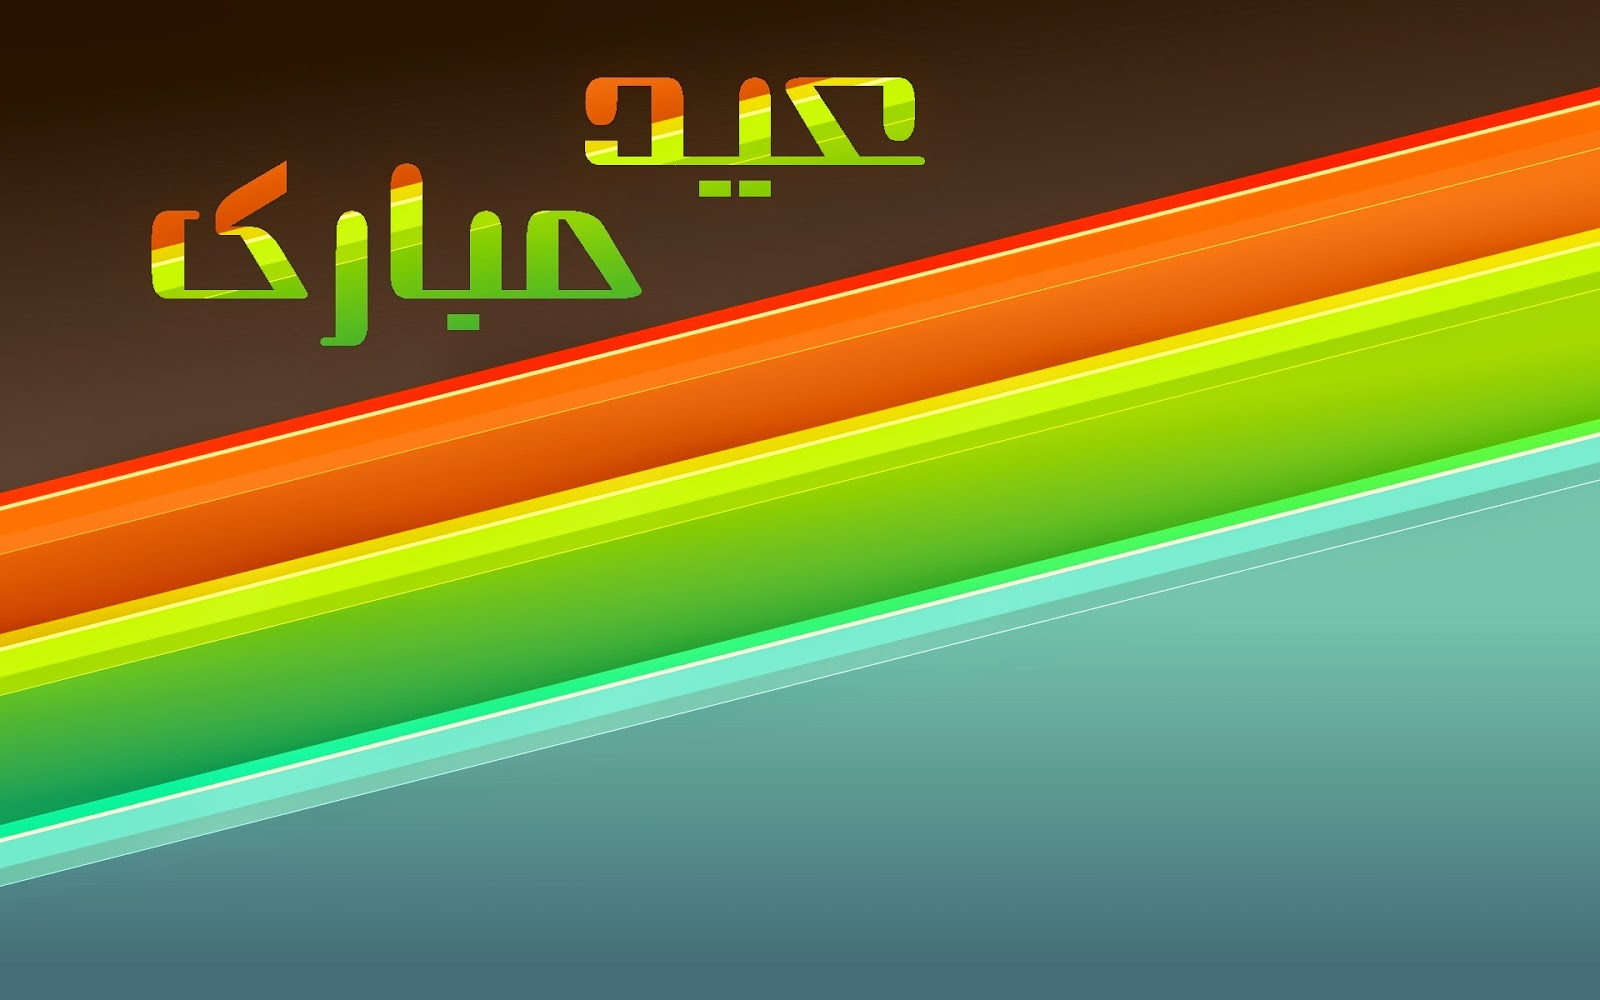 Stylish Eid ul Fitr Mubarak Cards, Free Eid Mubarak 2014 Cards